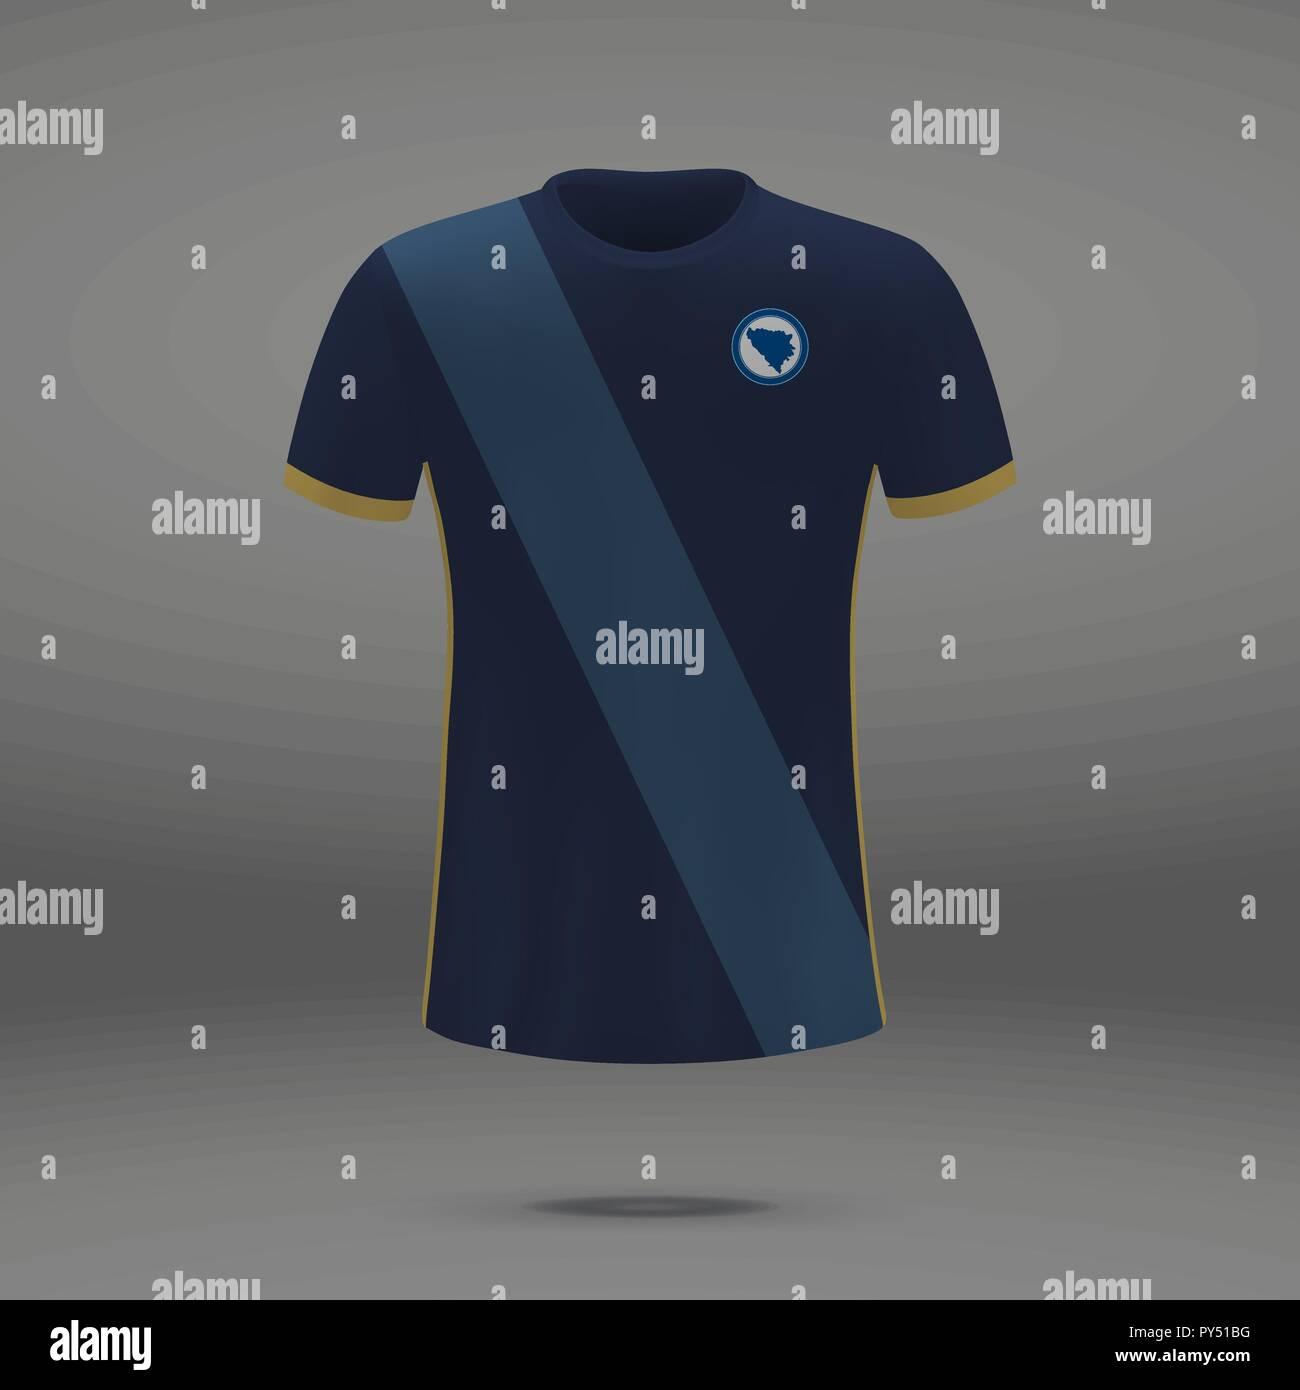 70c684836 football kit of Bosnia 2018, t-shirt template for soccer jersey. Vector  illustration